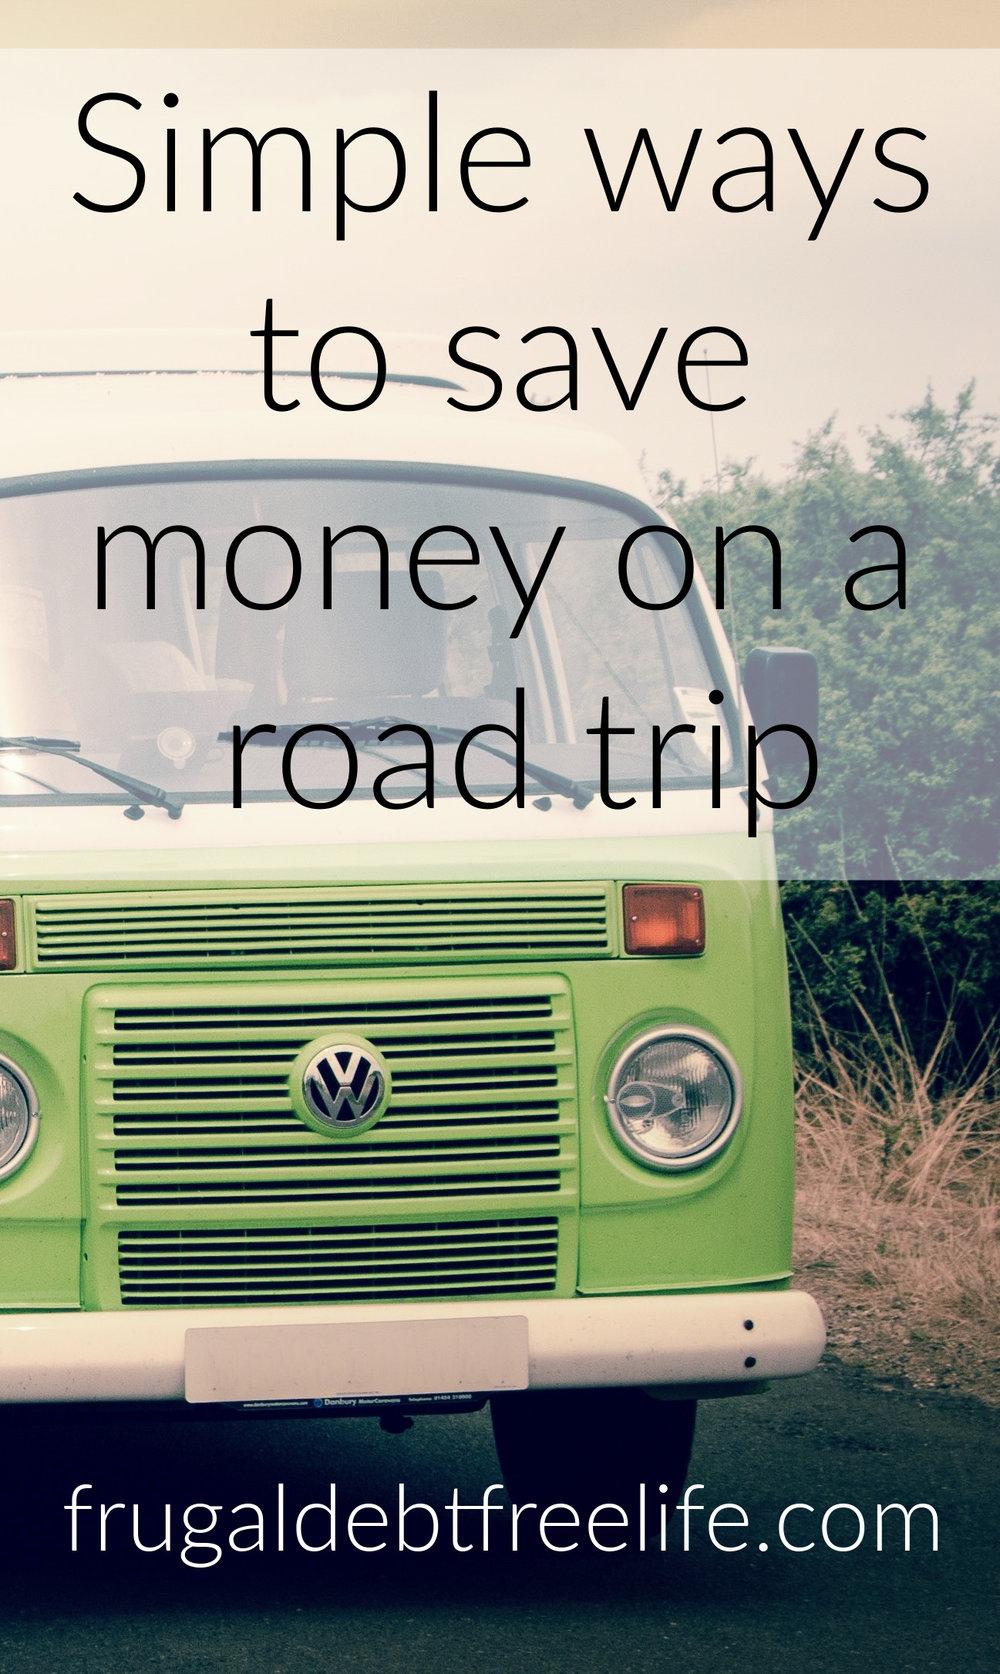 simple ways to save on road trips.jpg